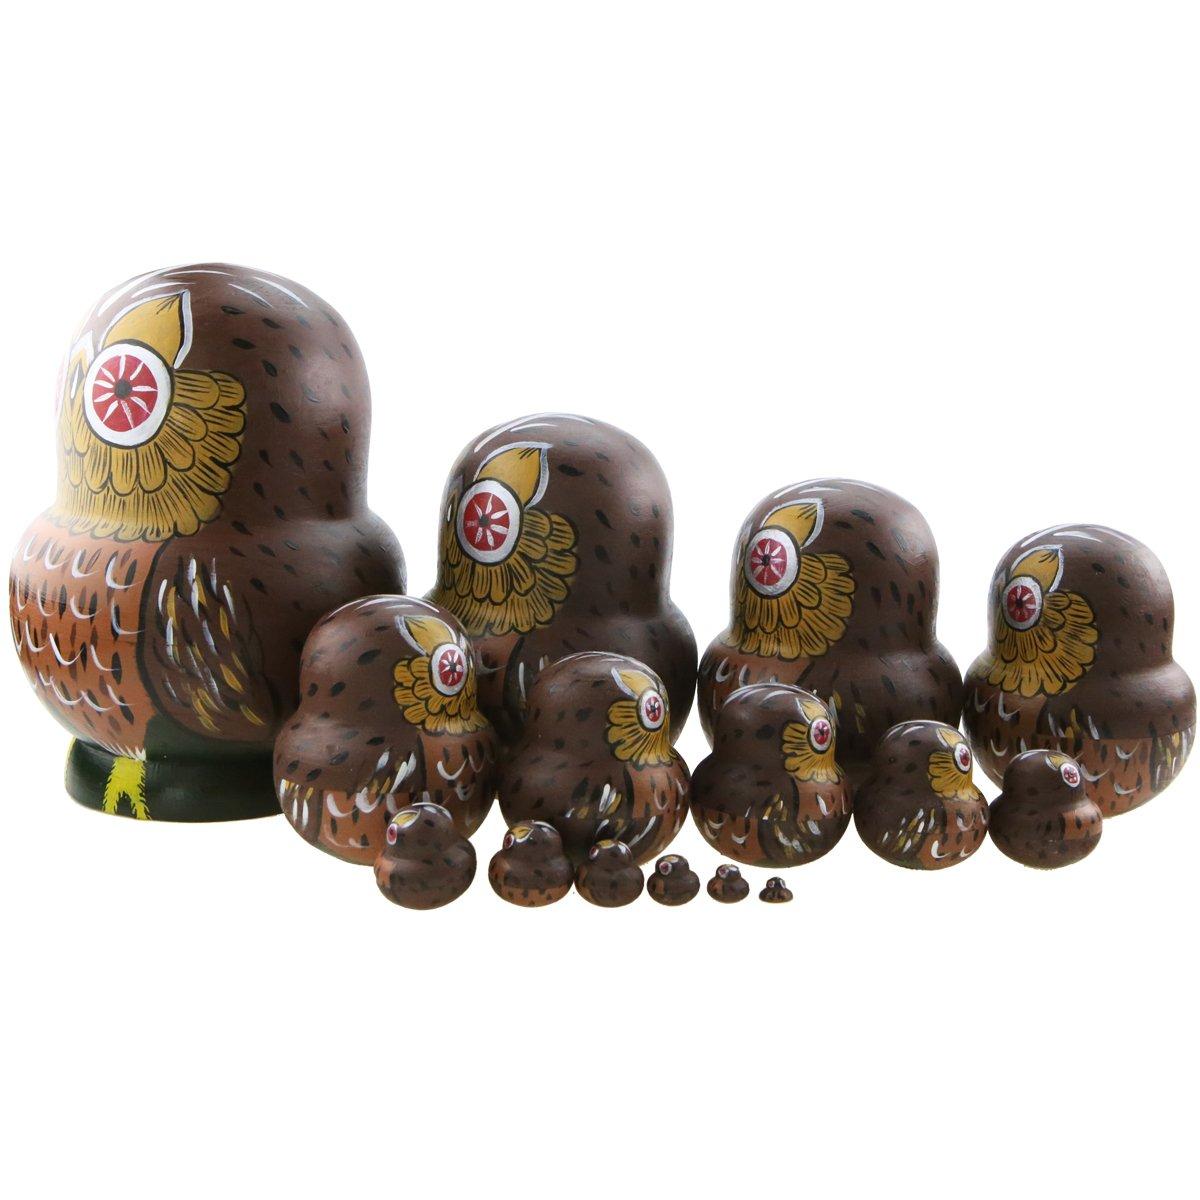 Winterworm Set of 15 Pieces Cartoon Brown Owl Russian Handmade Wooden Nesting Dolls Matryoshka Dolls for Birthday Christmas New Year Gift Home Decoration Kids Toy by Winterworm (Image #4)